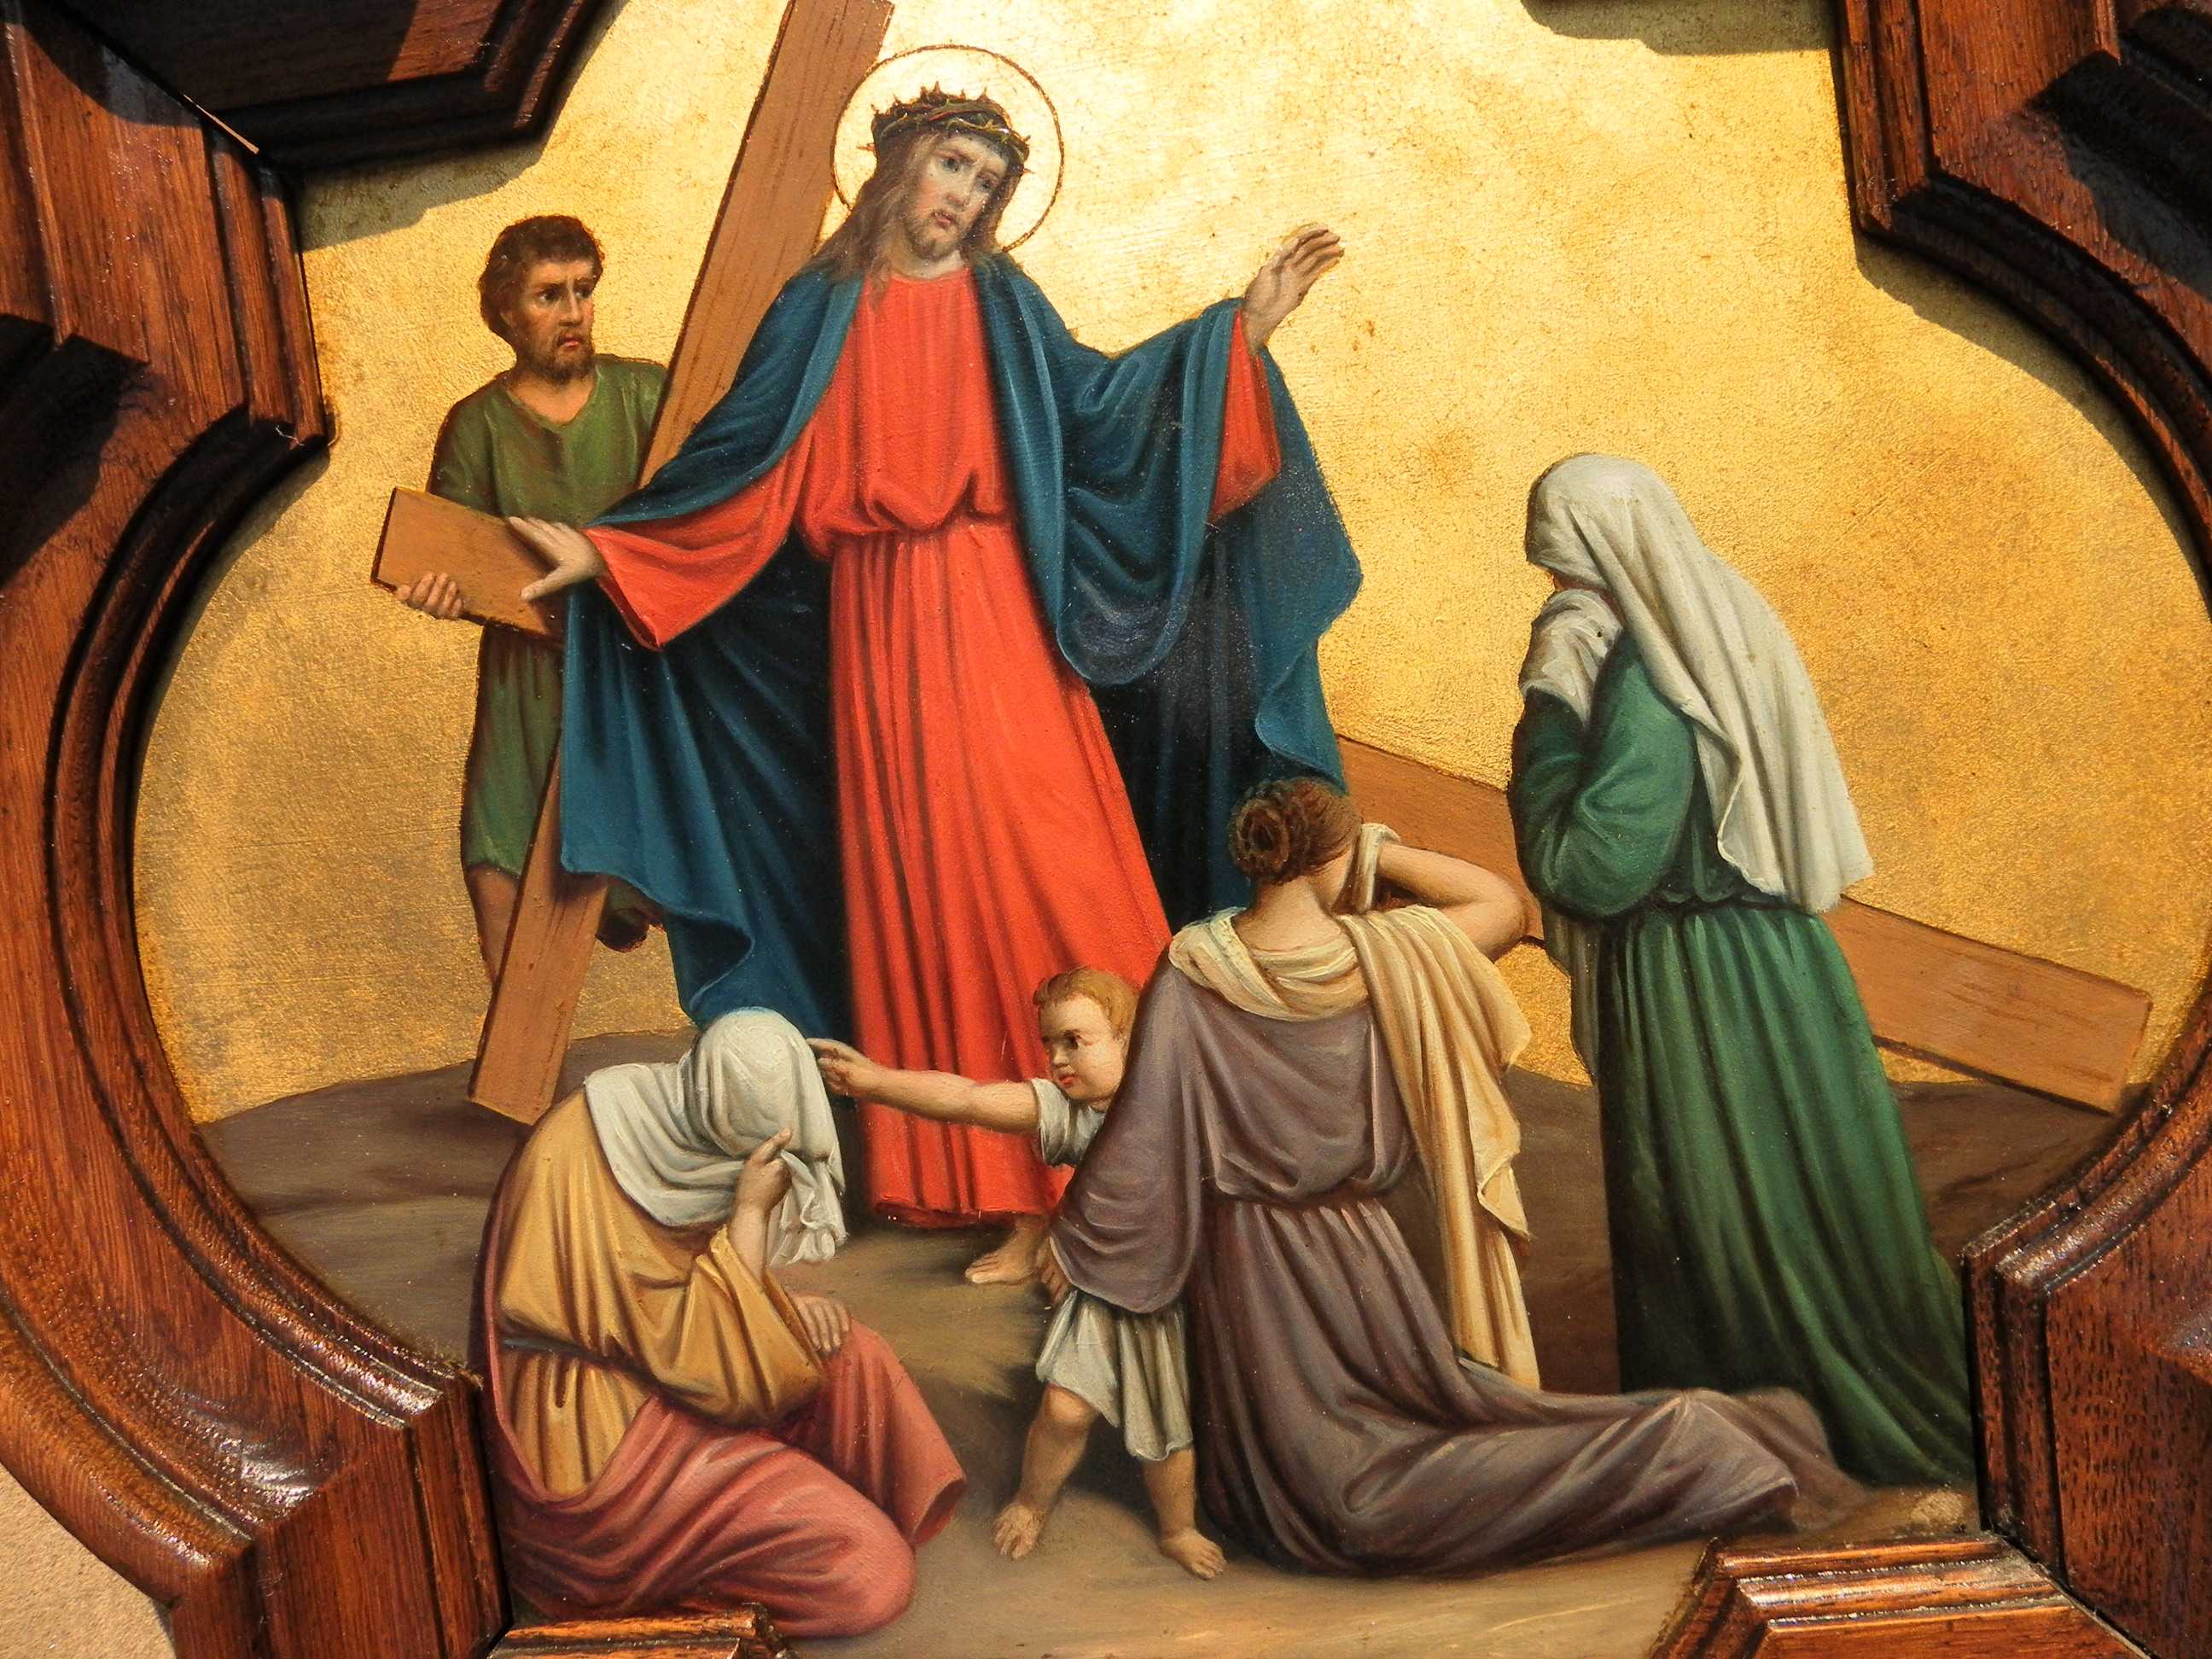 saint regis falls single catholic girls M square boys&girls bronx priprev 1 (90214) 25 saint regis rd hogansburg, ny 13655: single parent manhattan priprev (90227.